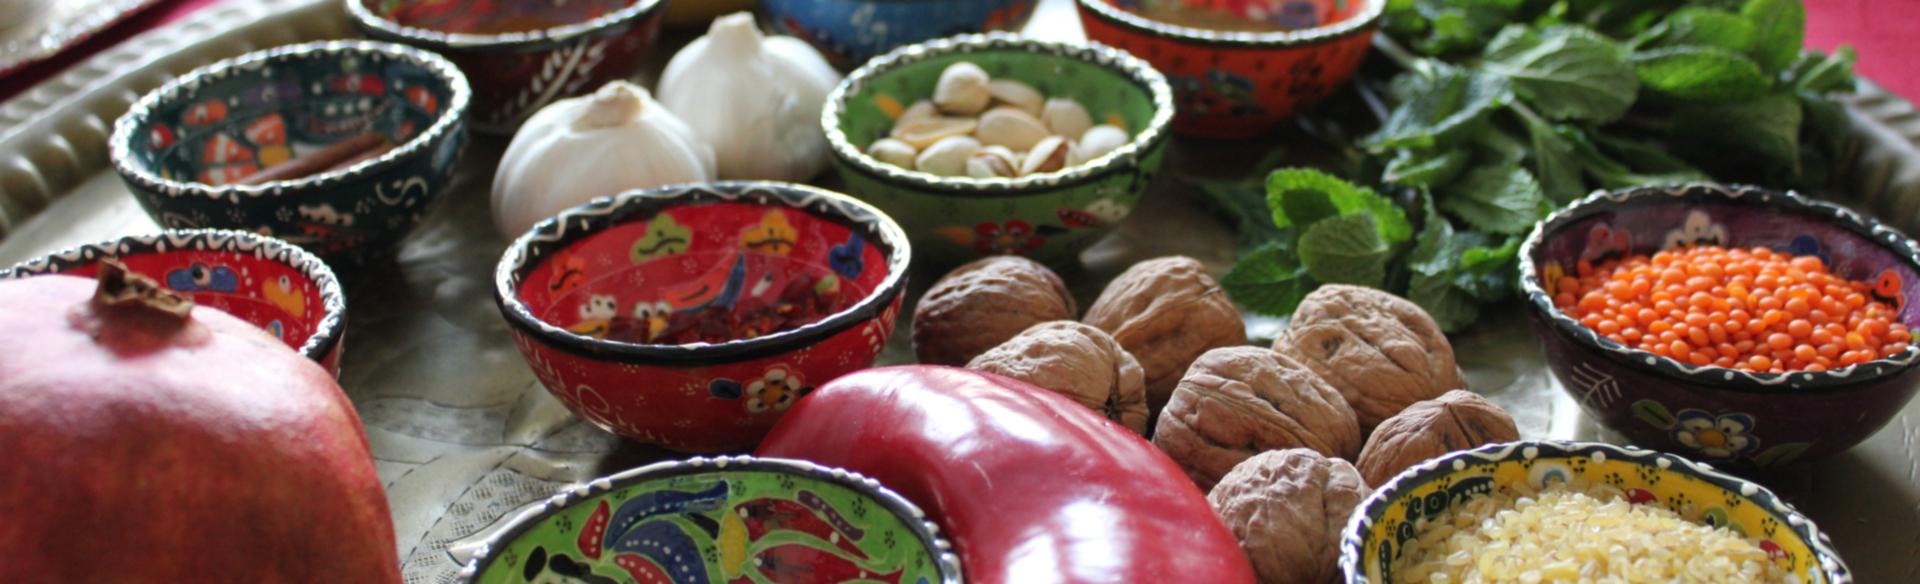 Orientalisches Catering